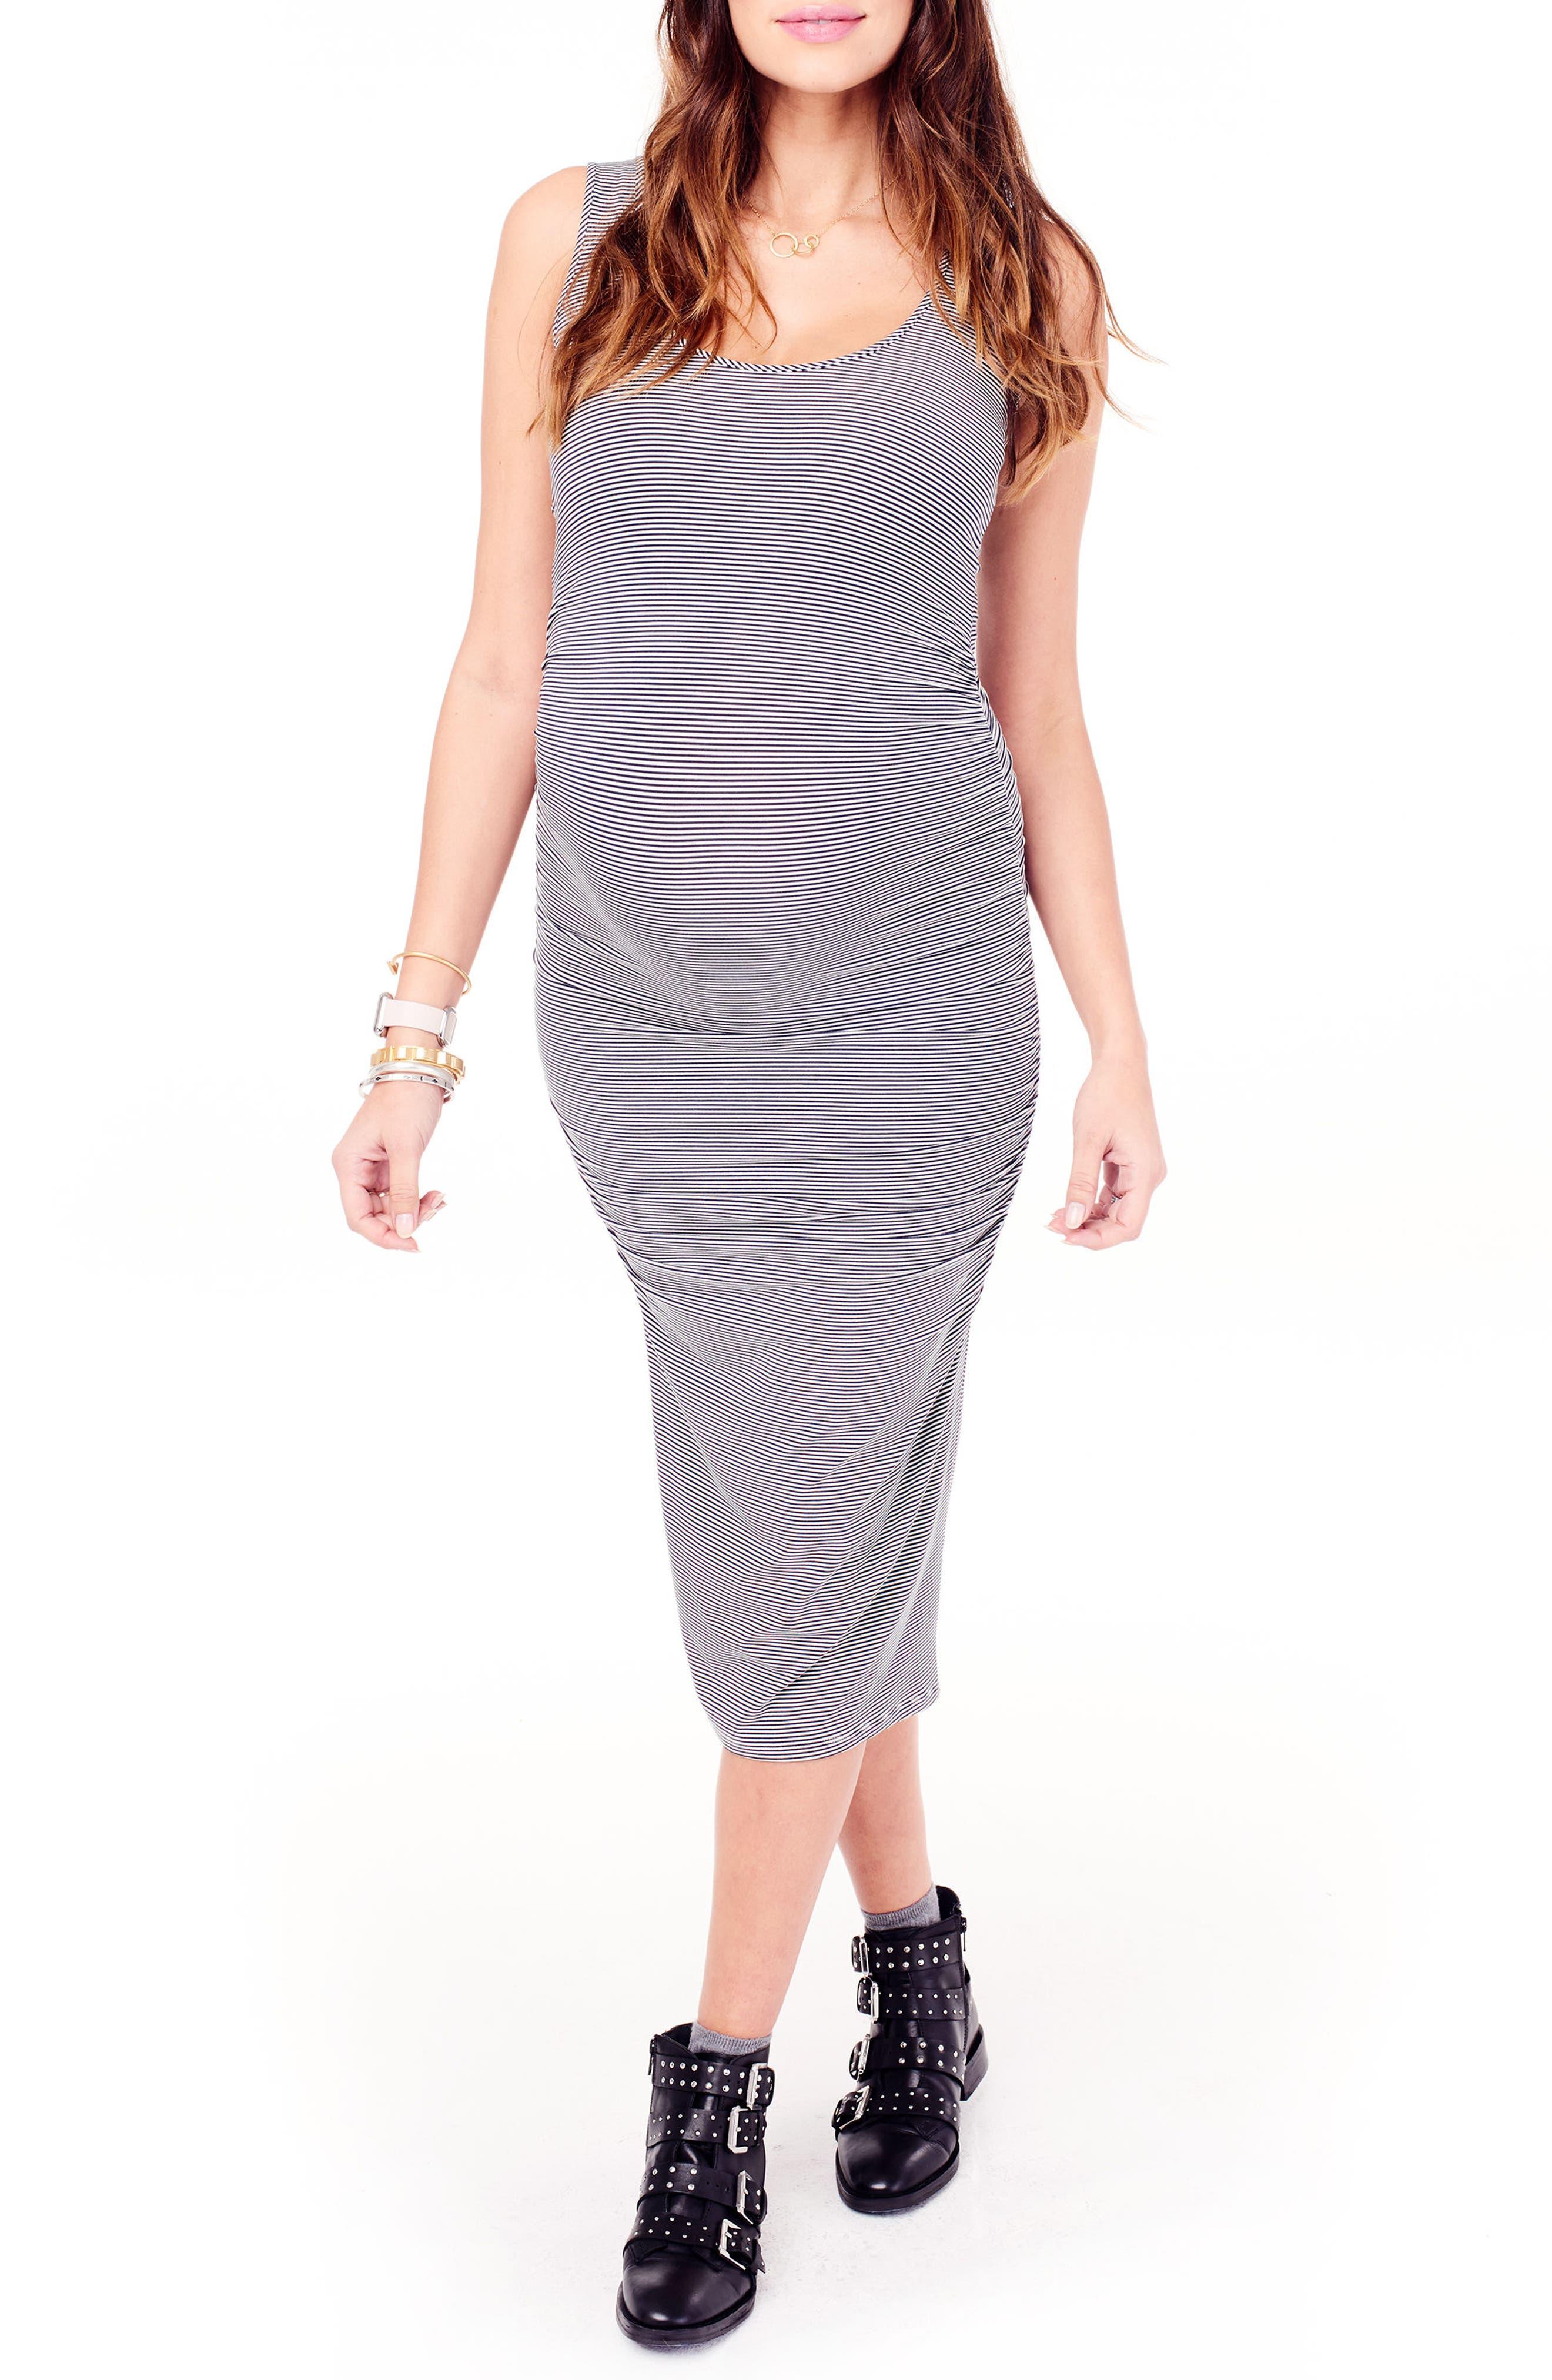 Shirred Midi Maternity Tank Dress,                             Main thumbnail 1, color,                             TRUE NAVY/ IVORY MICROSTRIPE